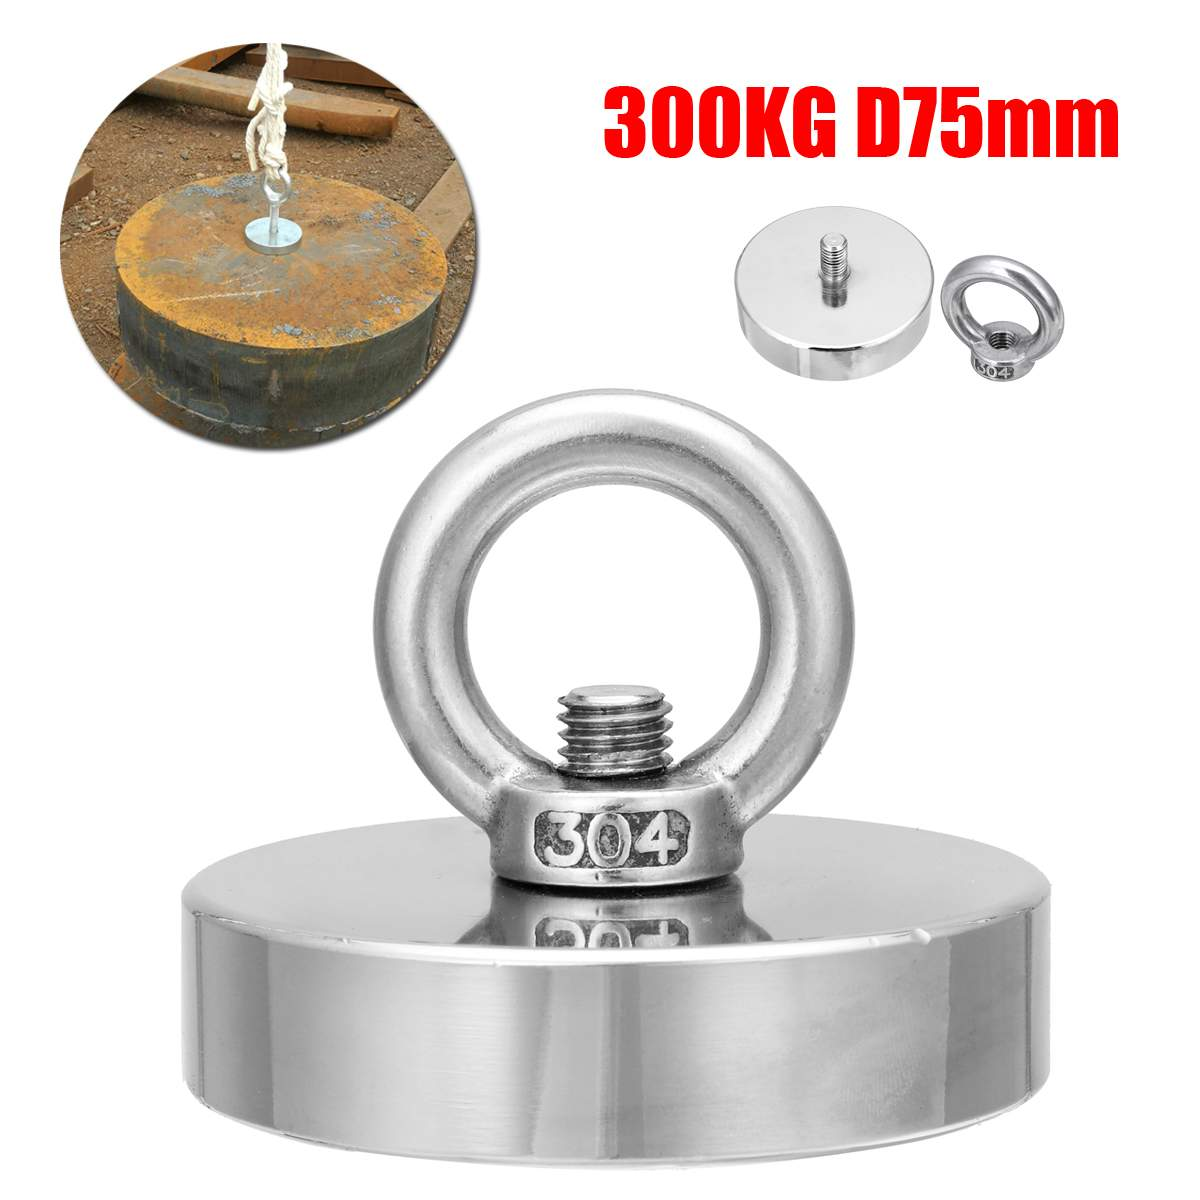 300 kg D75mm Starke Salvage Neodym Magnet Angeln Deap Meer Salvage Recovery Abrufen Schatz Jagd Magnet